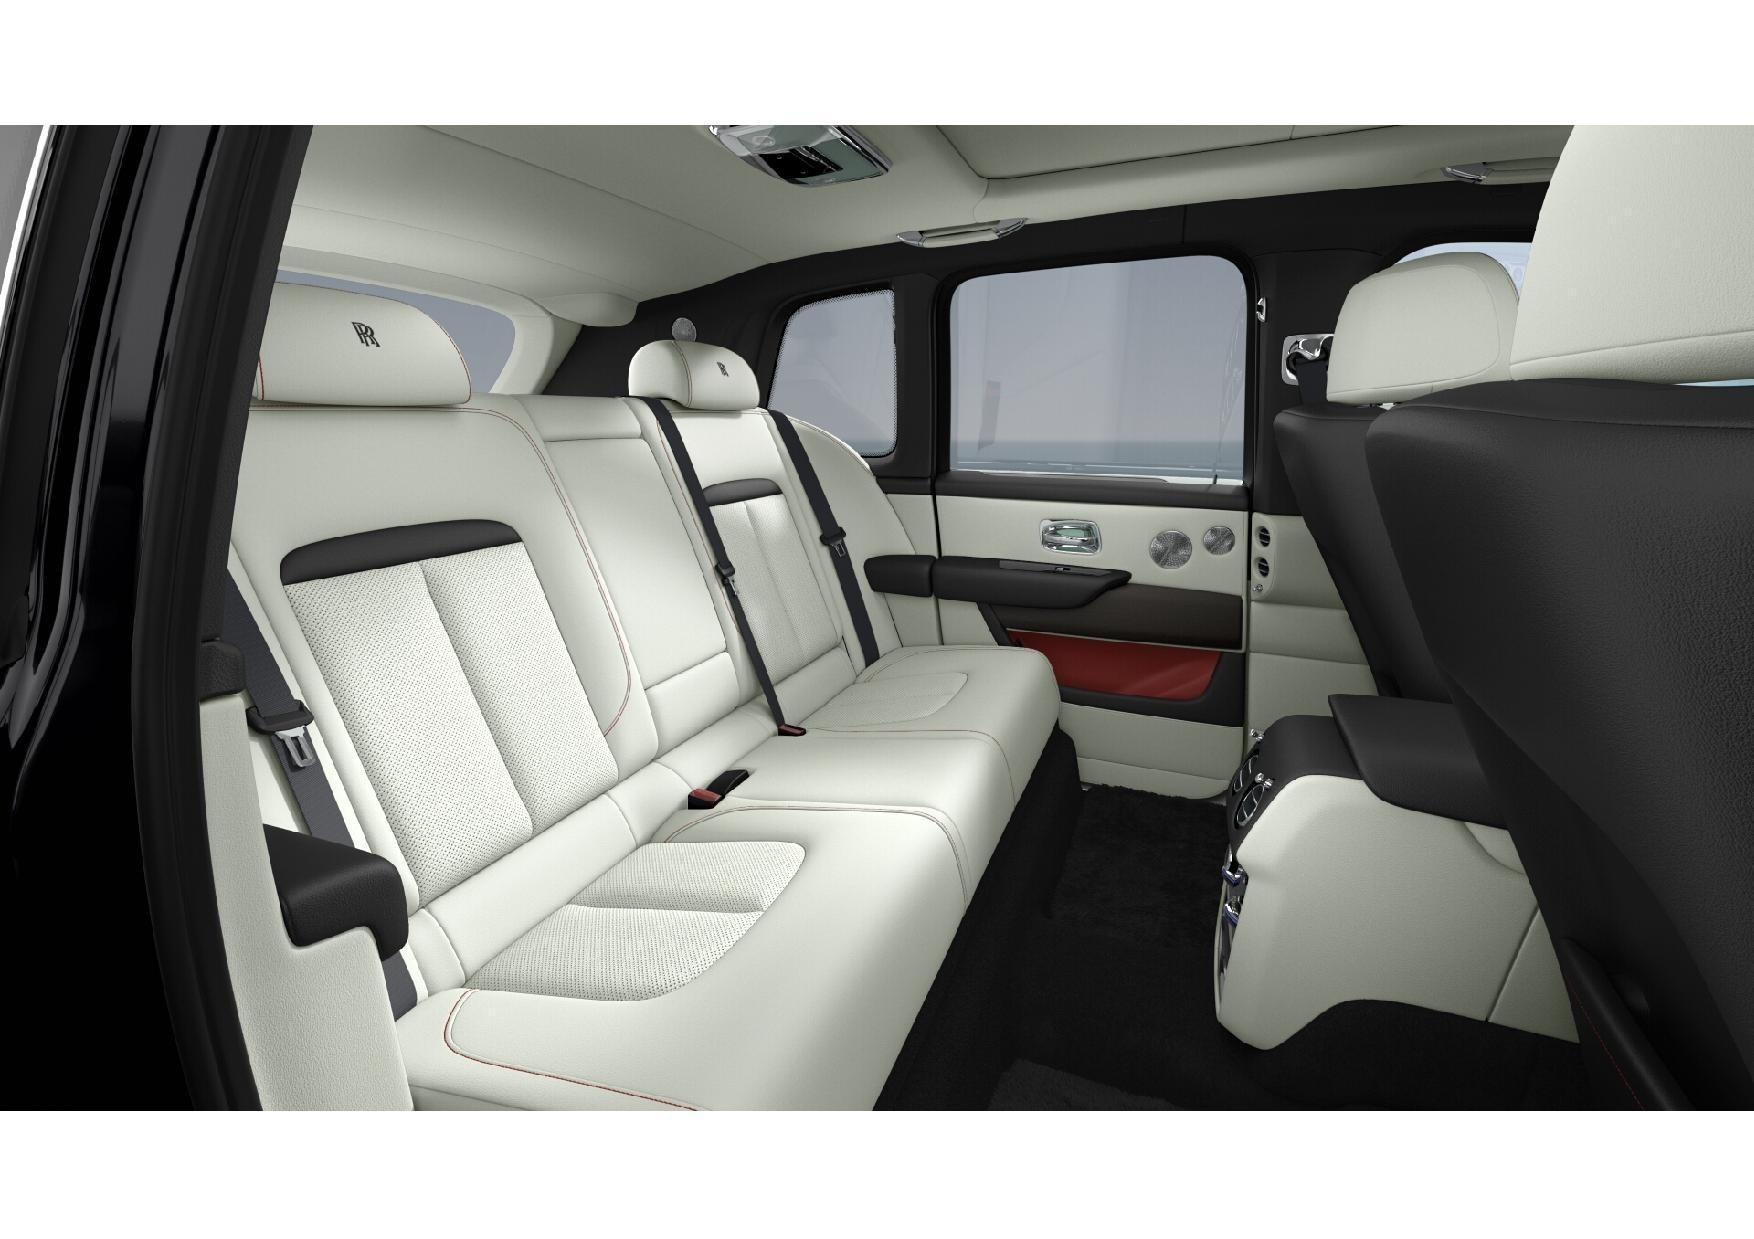 New 2019 Rolls-Royce Cullinan  For Sale In Greenwich, CT 3100_p7